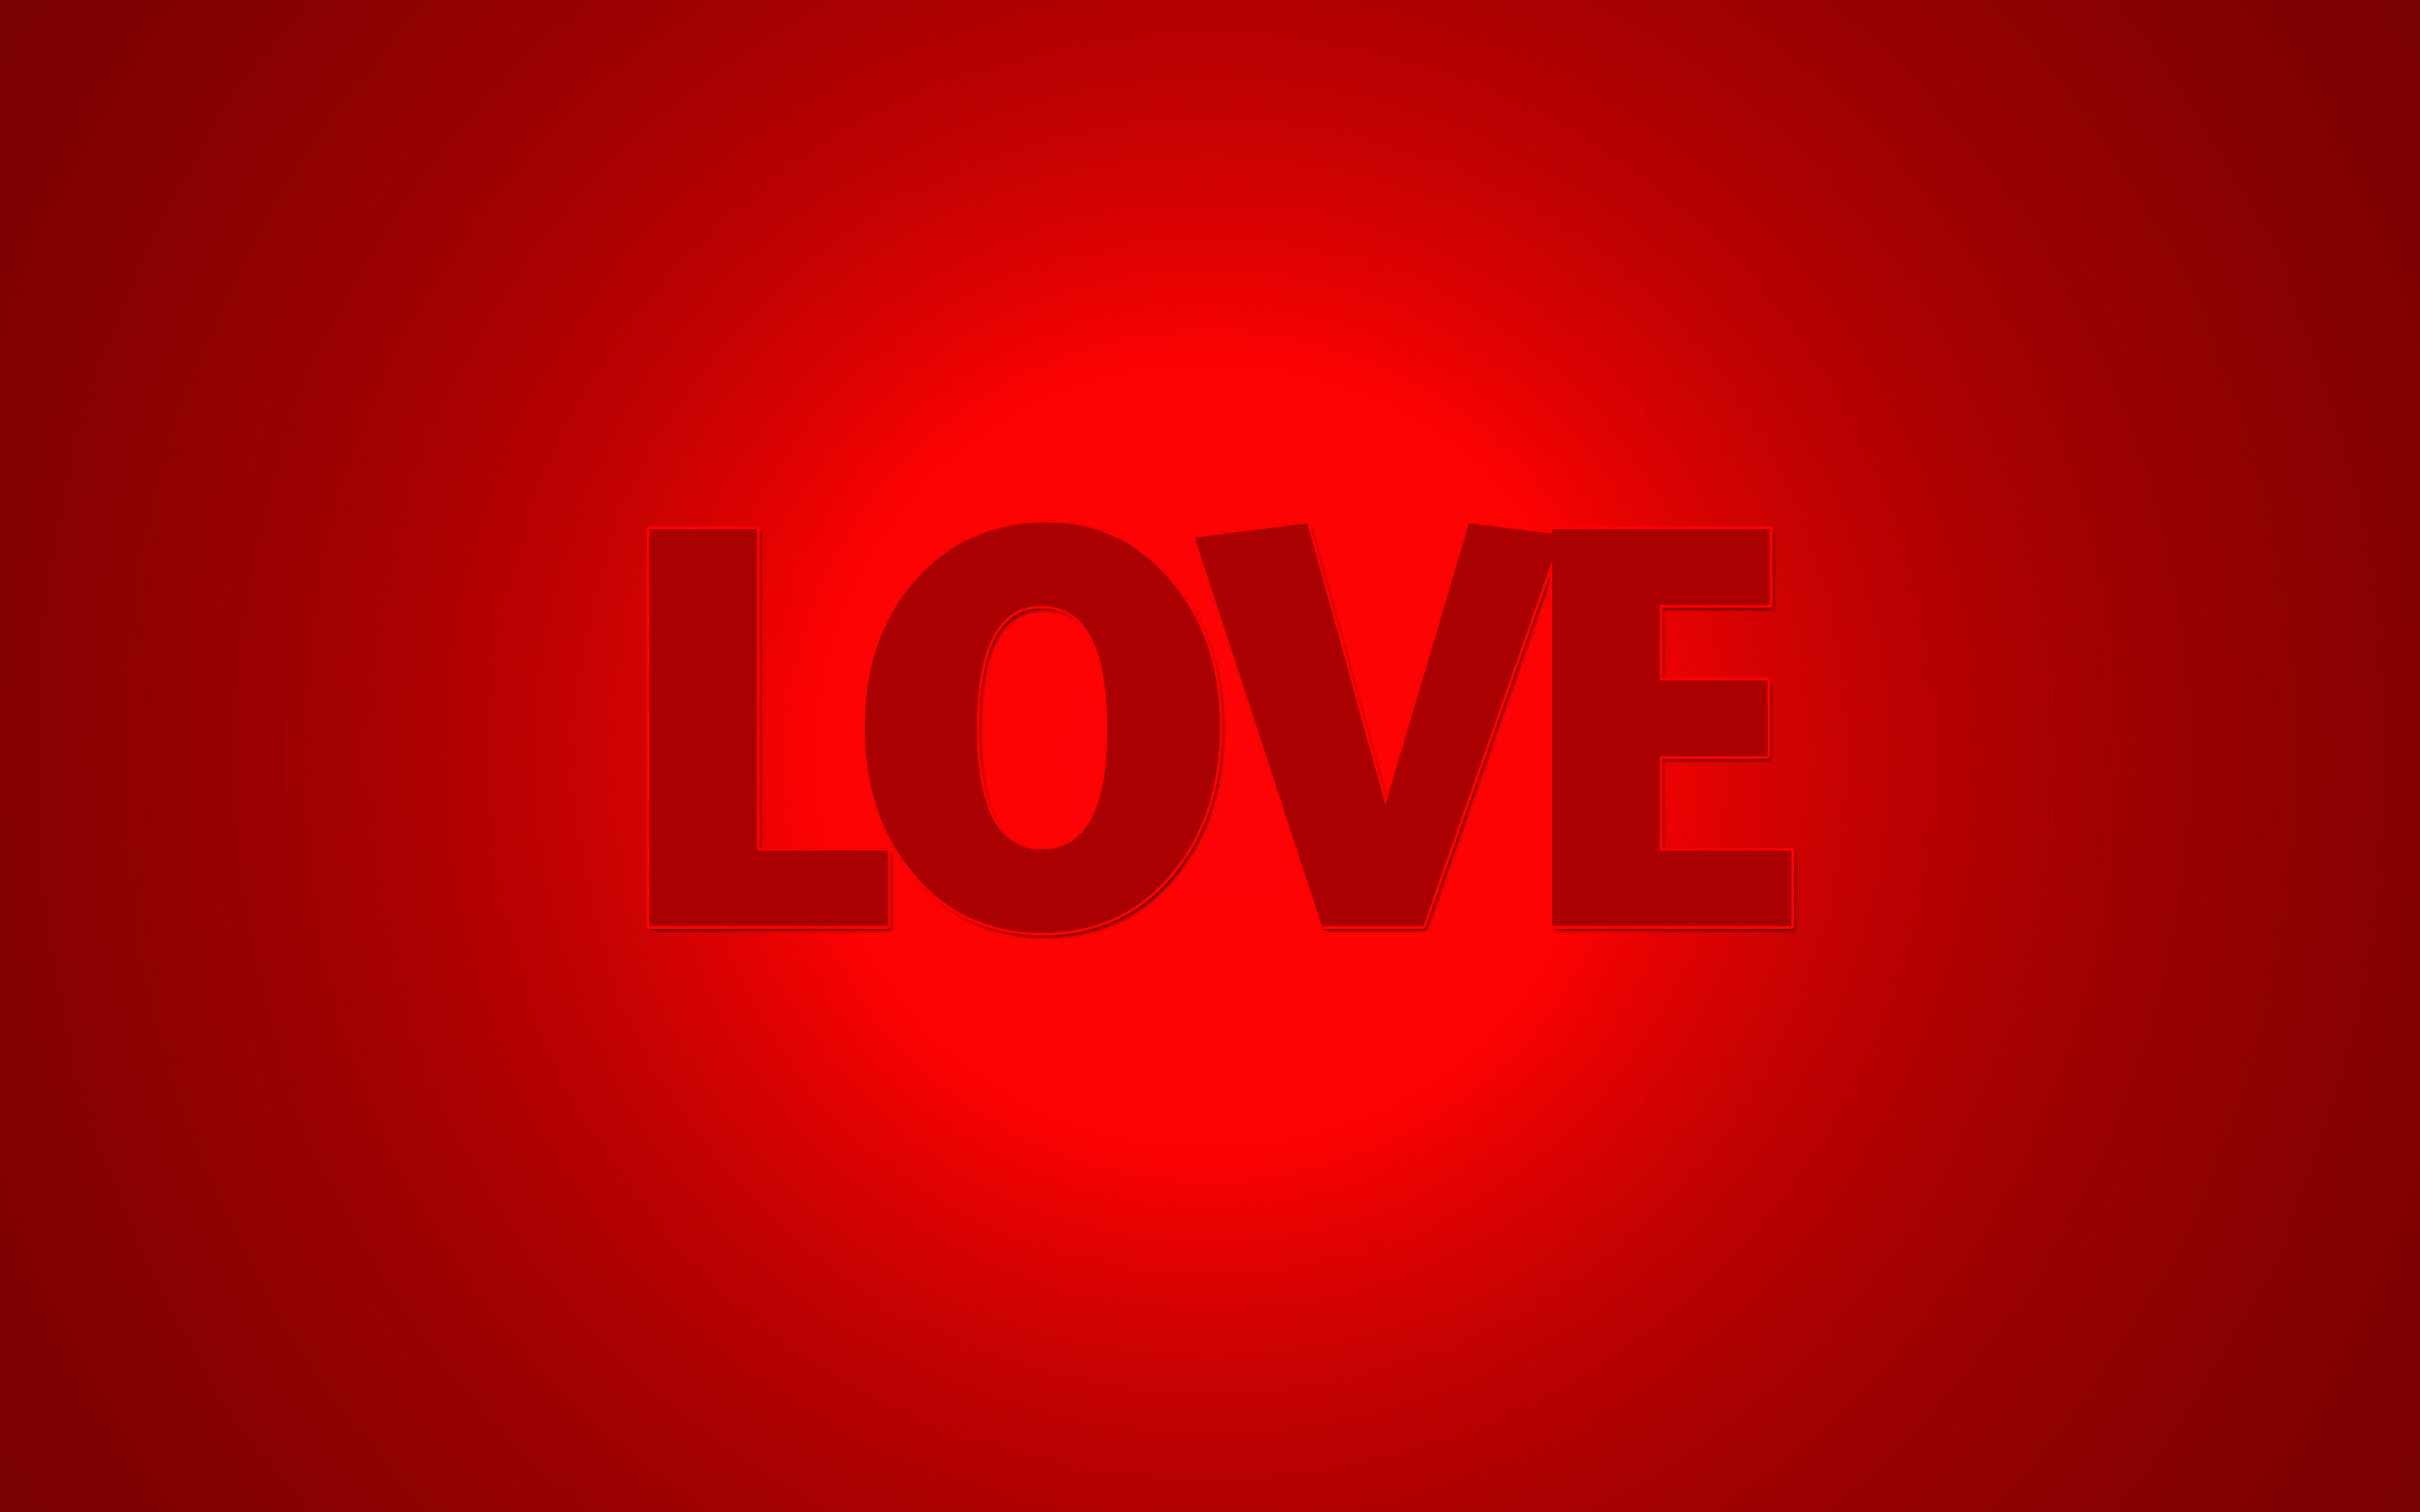 love text wide wallpaper 50431